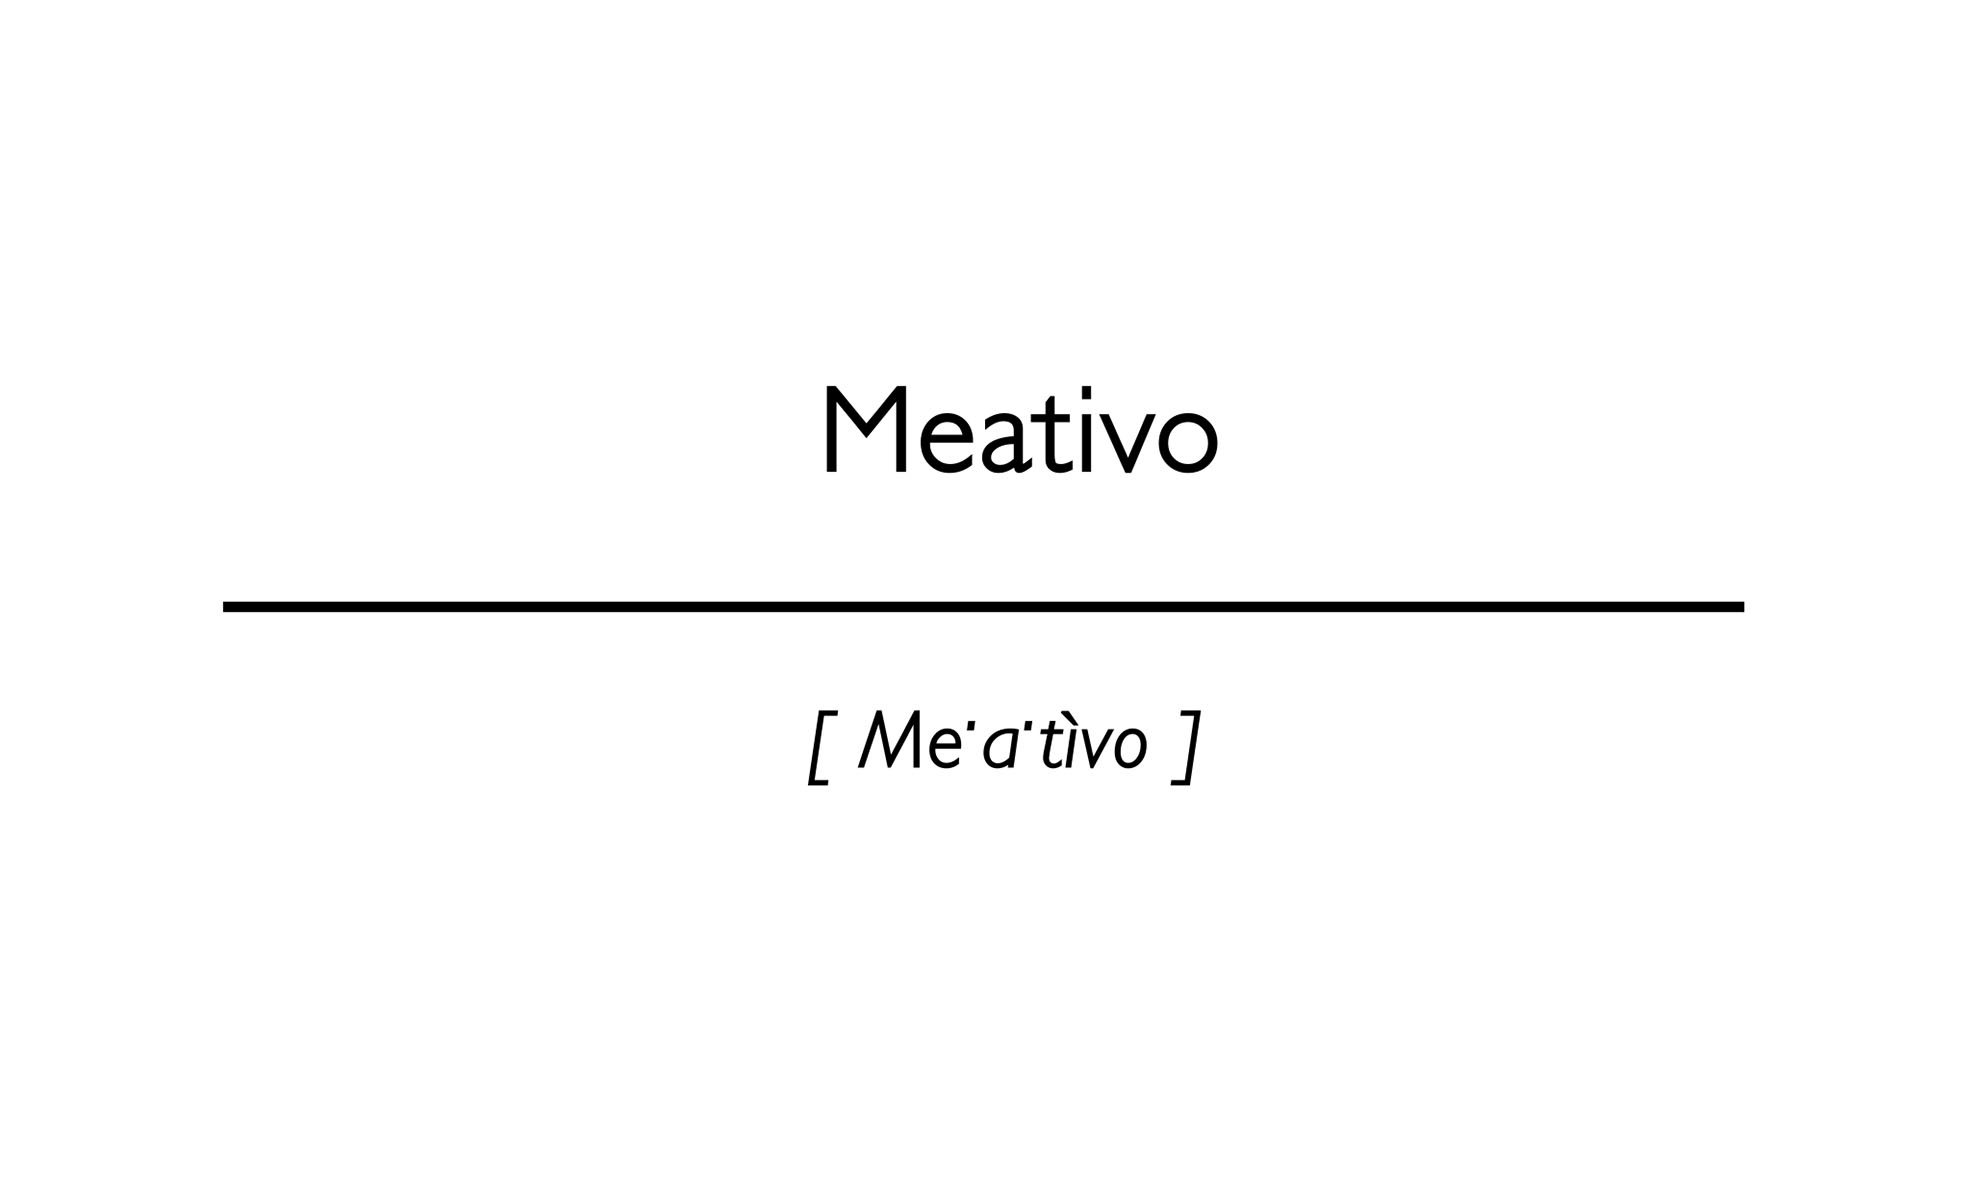 word Meativo